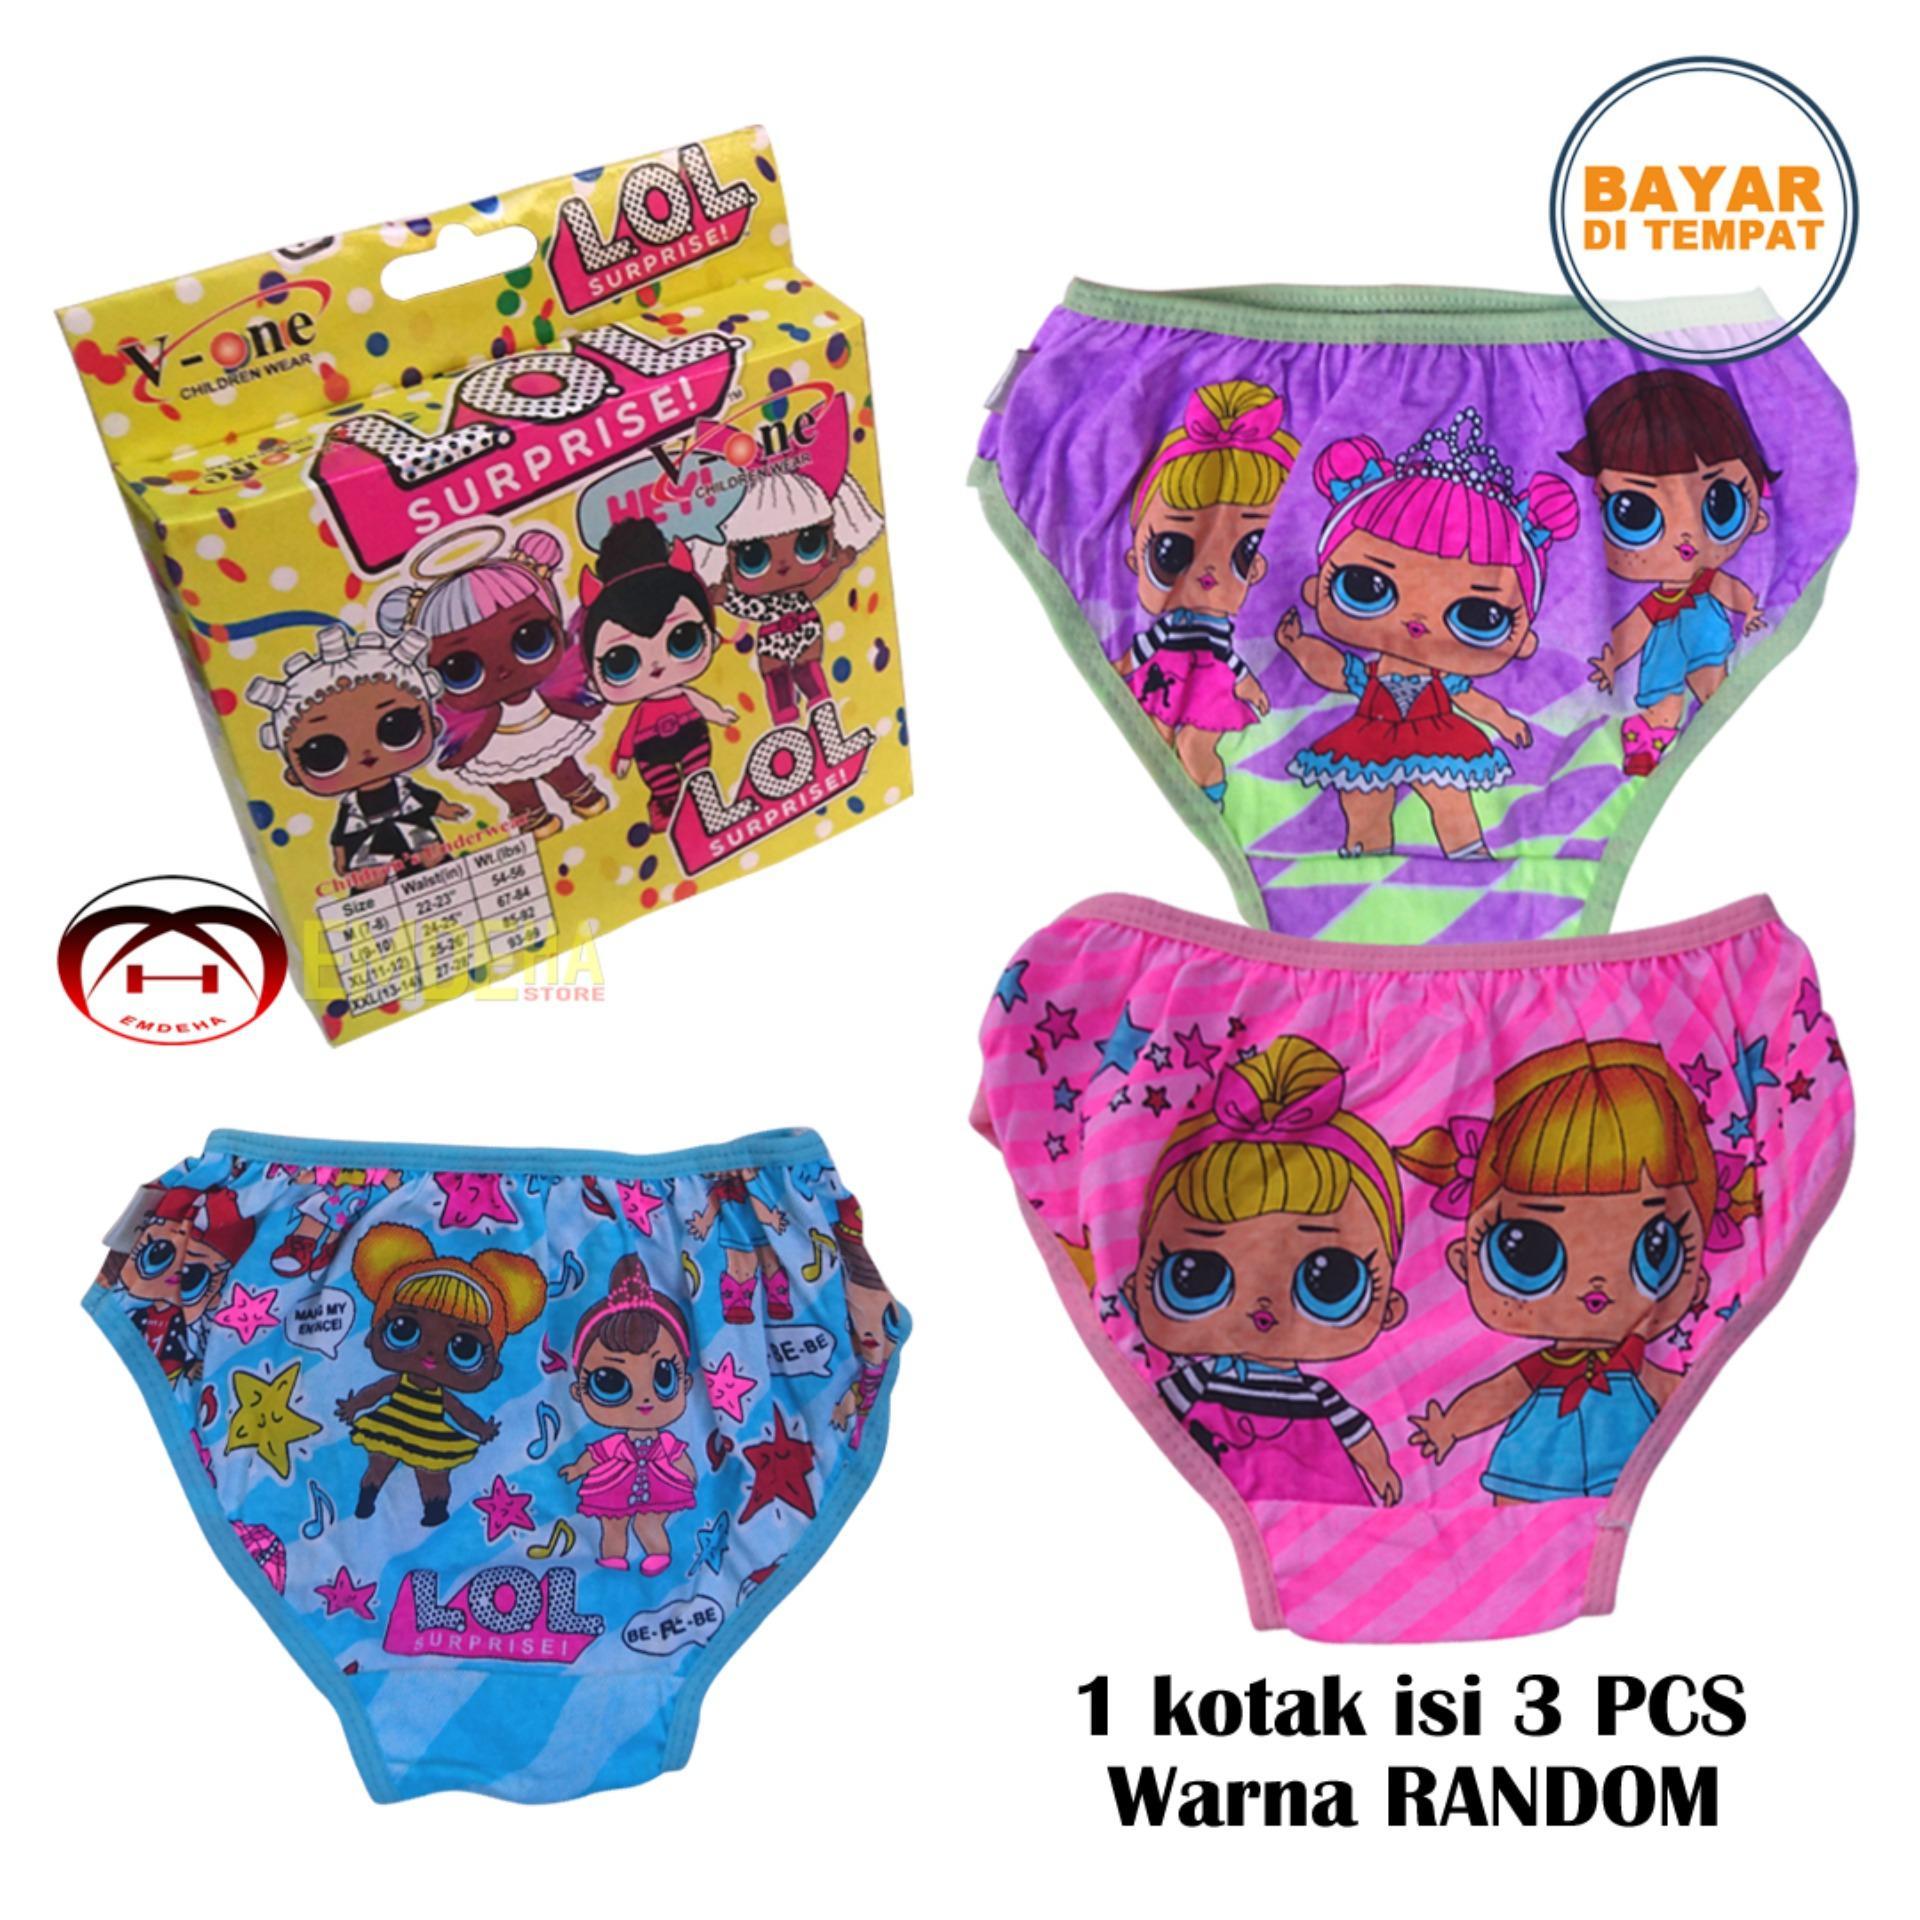 Emdeha Store - 3 Pcs Celana Dalam Anak Perempuan Motif Karakter Gaul Dan Keren Size M, L Dan Xl By Emdeha Store.